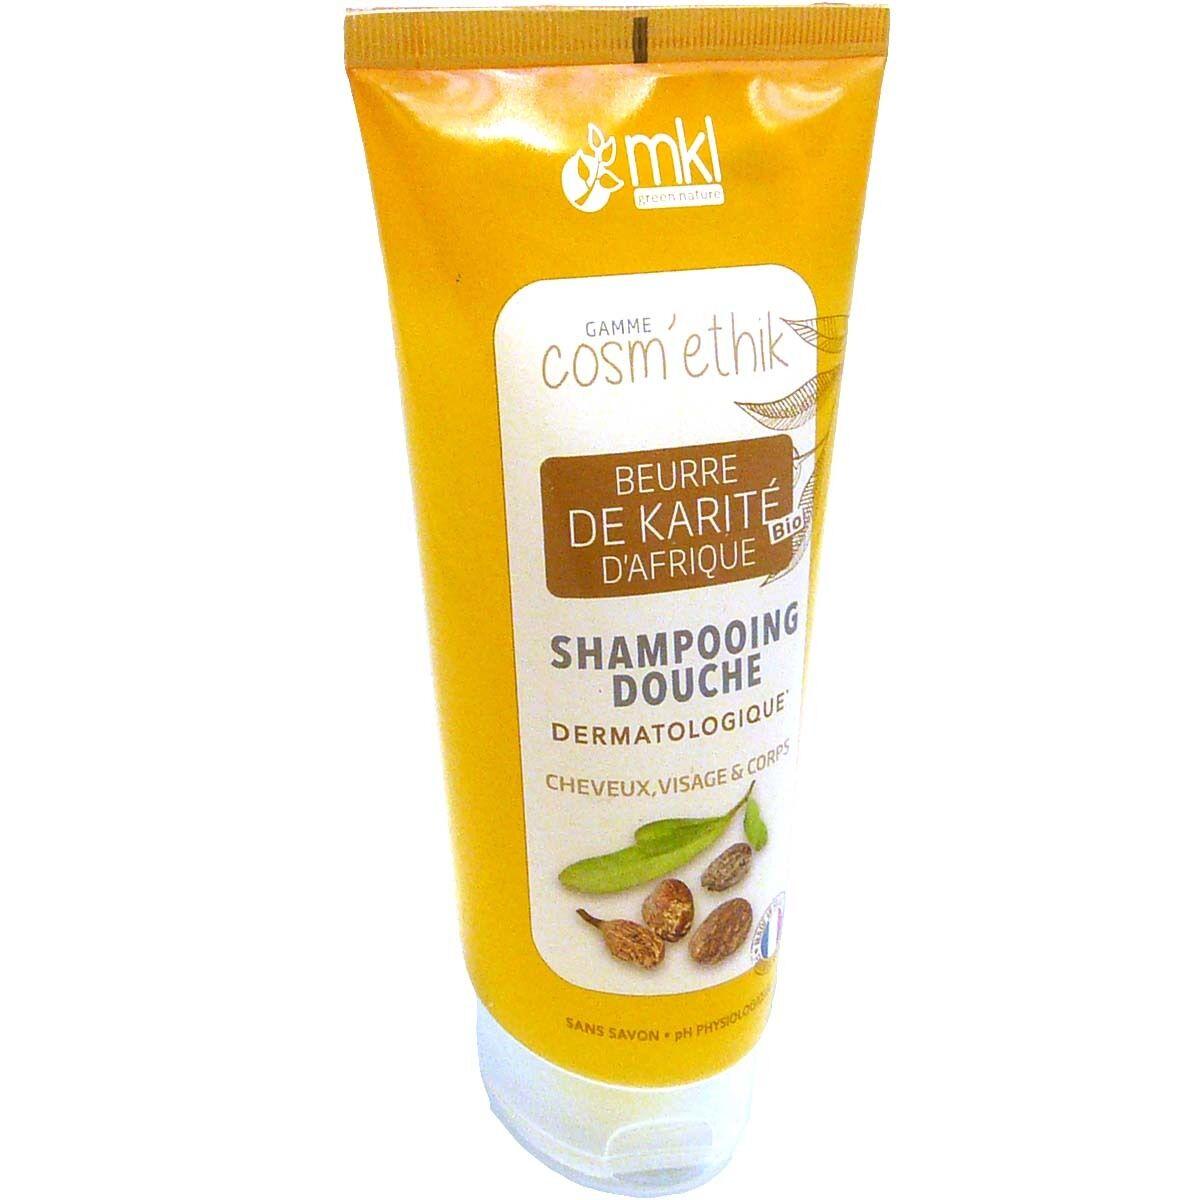 Mkl cosm'ethik shampooing douche au beurre de karite bio 200ml